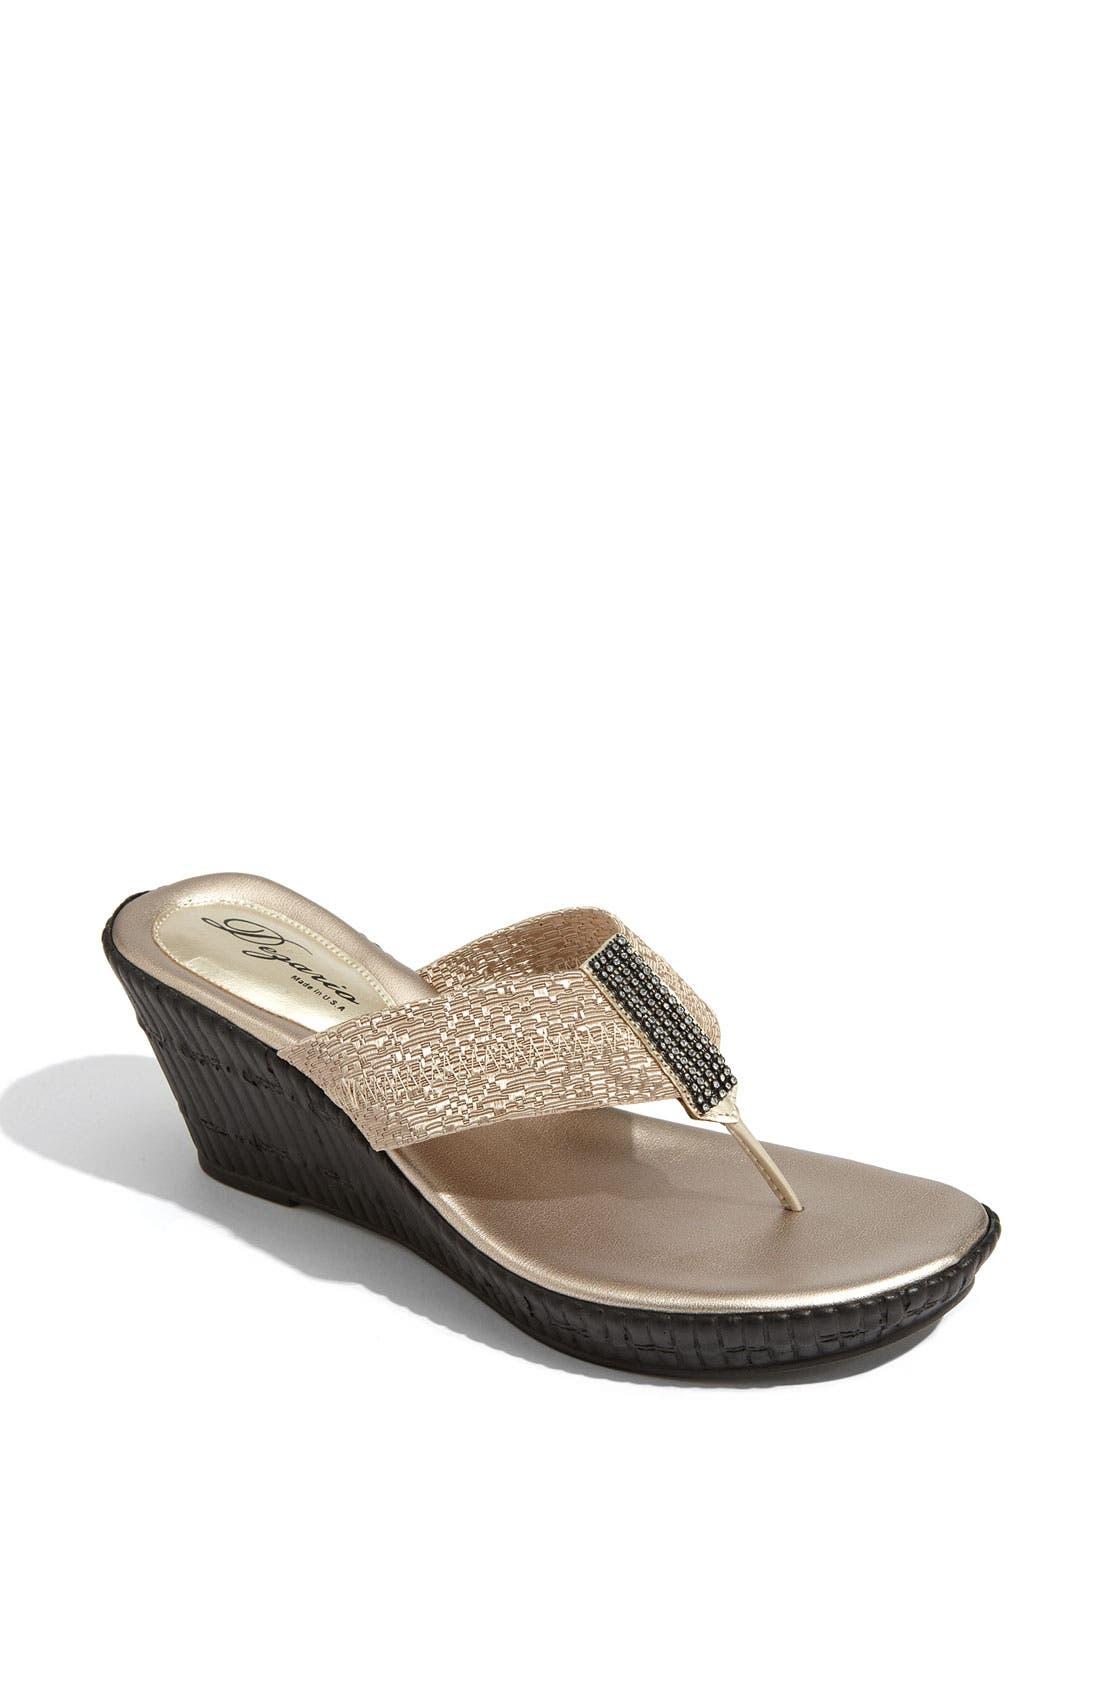 Alternate Image 1 Selected - Dezario 'Imperial' Sandal